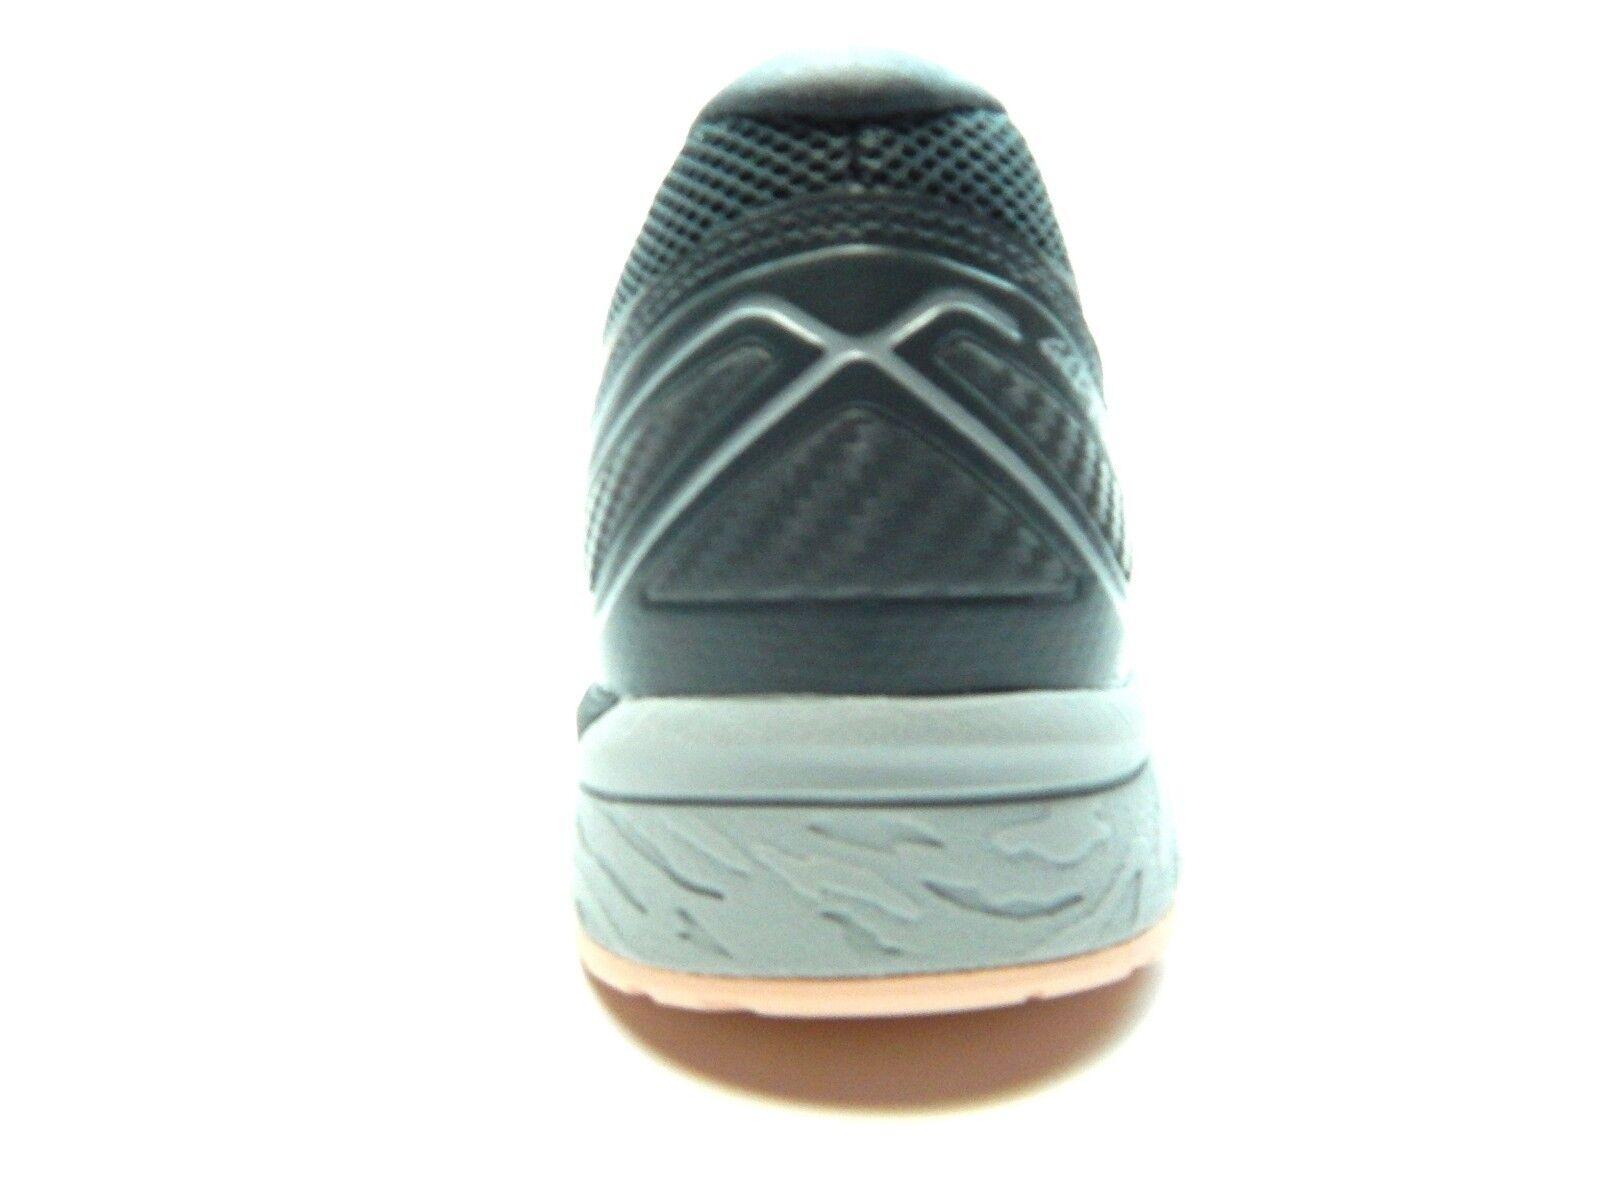 ASICS GEL FUJI TRABUCO 6 T7E9N 9697 MID SIZE GREY CARBON WOMEN Schuhe SIZE MID 7.5 TO 11.5 8f9072